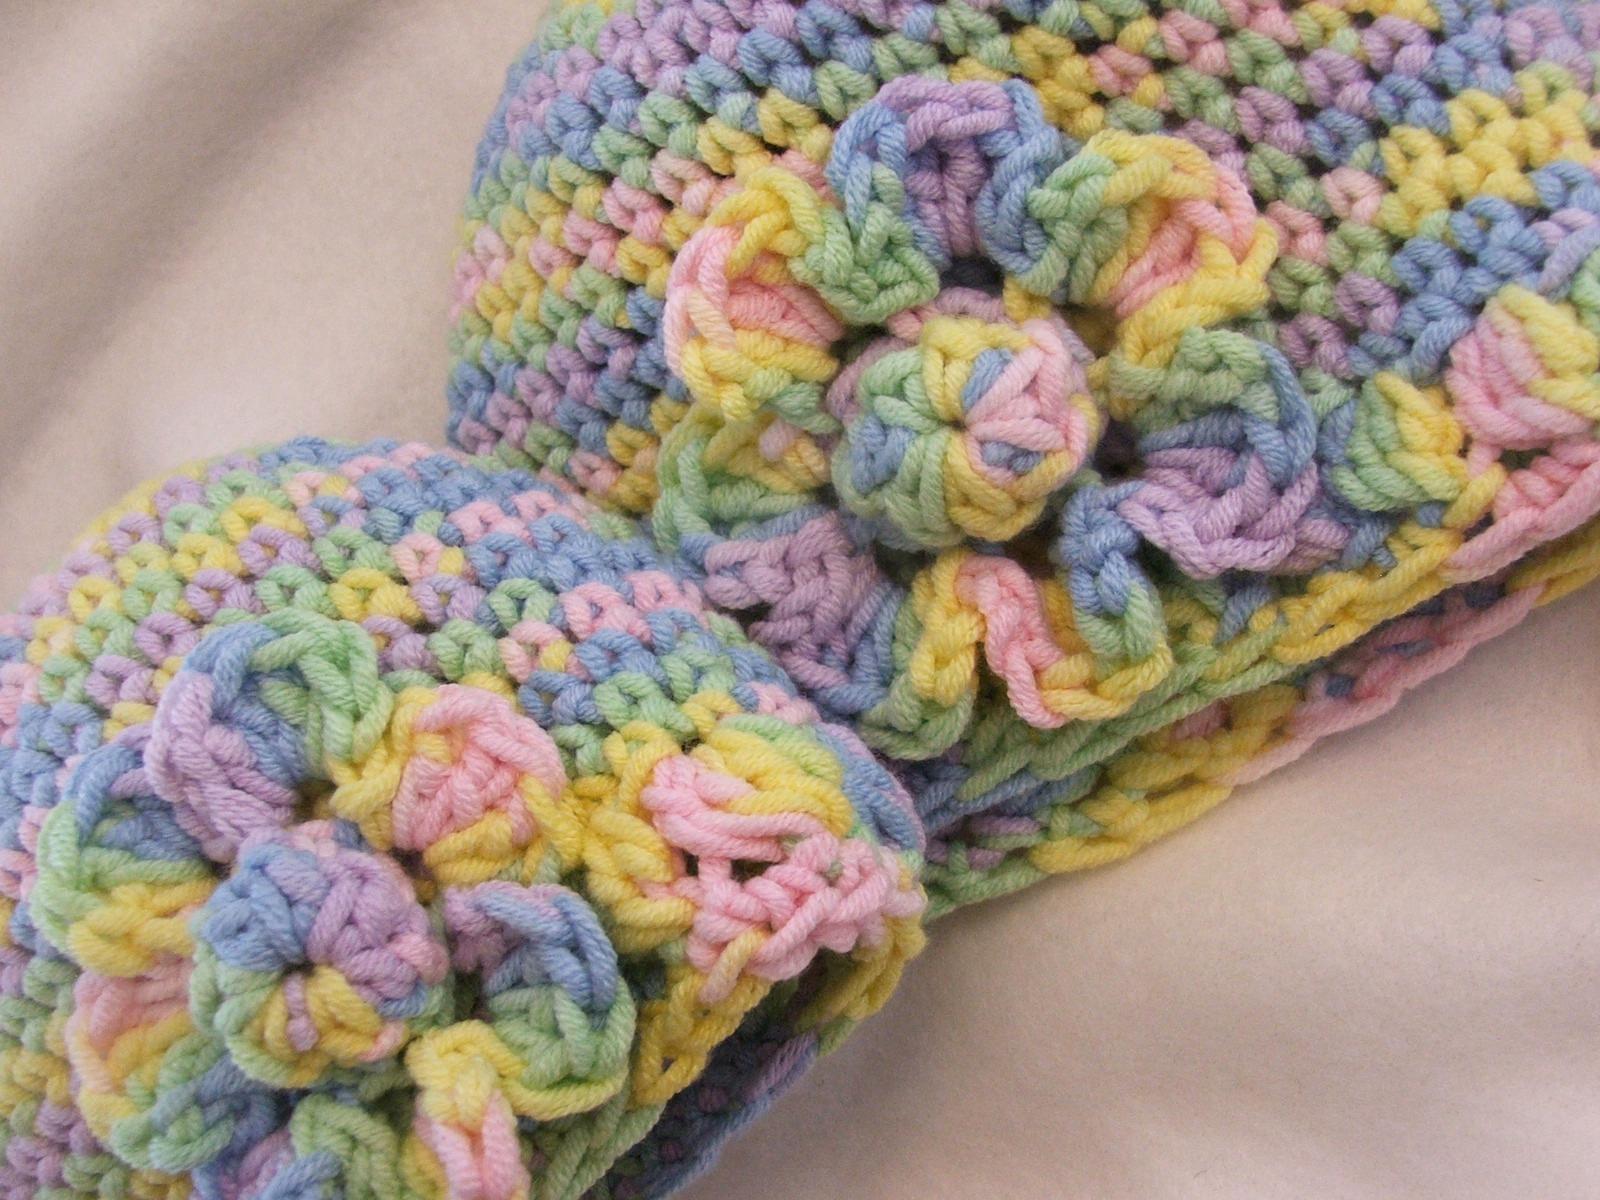 Susan S Hippie Crochet Chunky Yarn So Yummy You Could